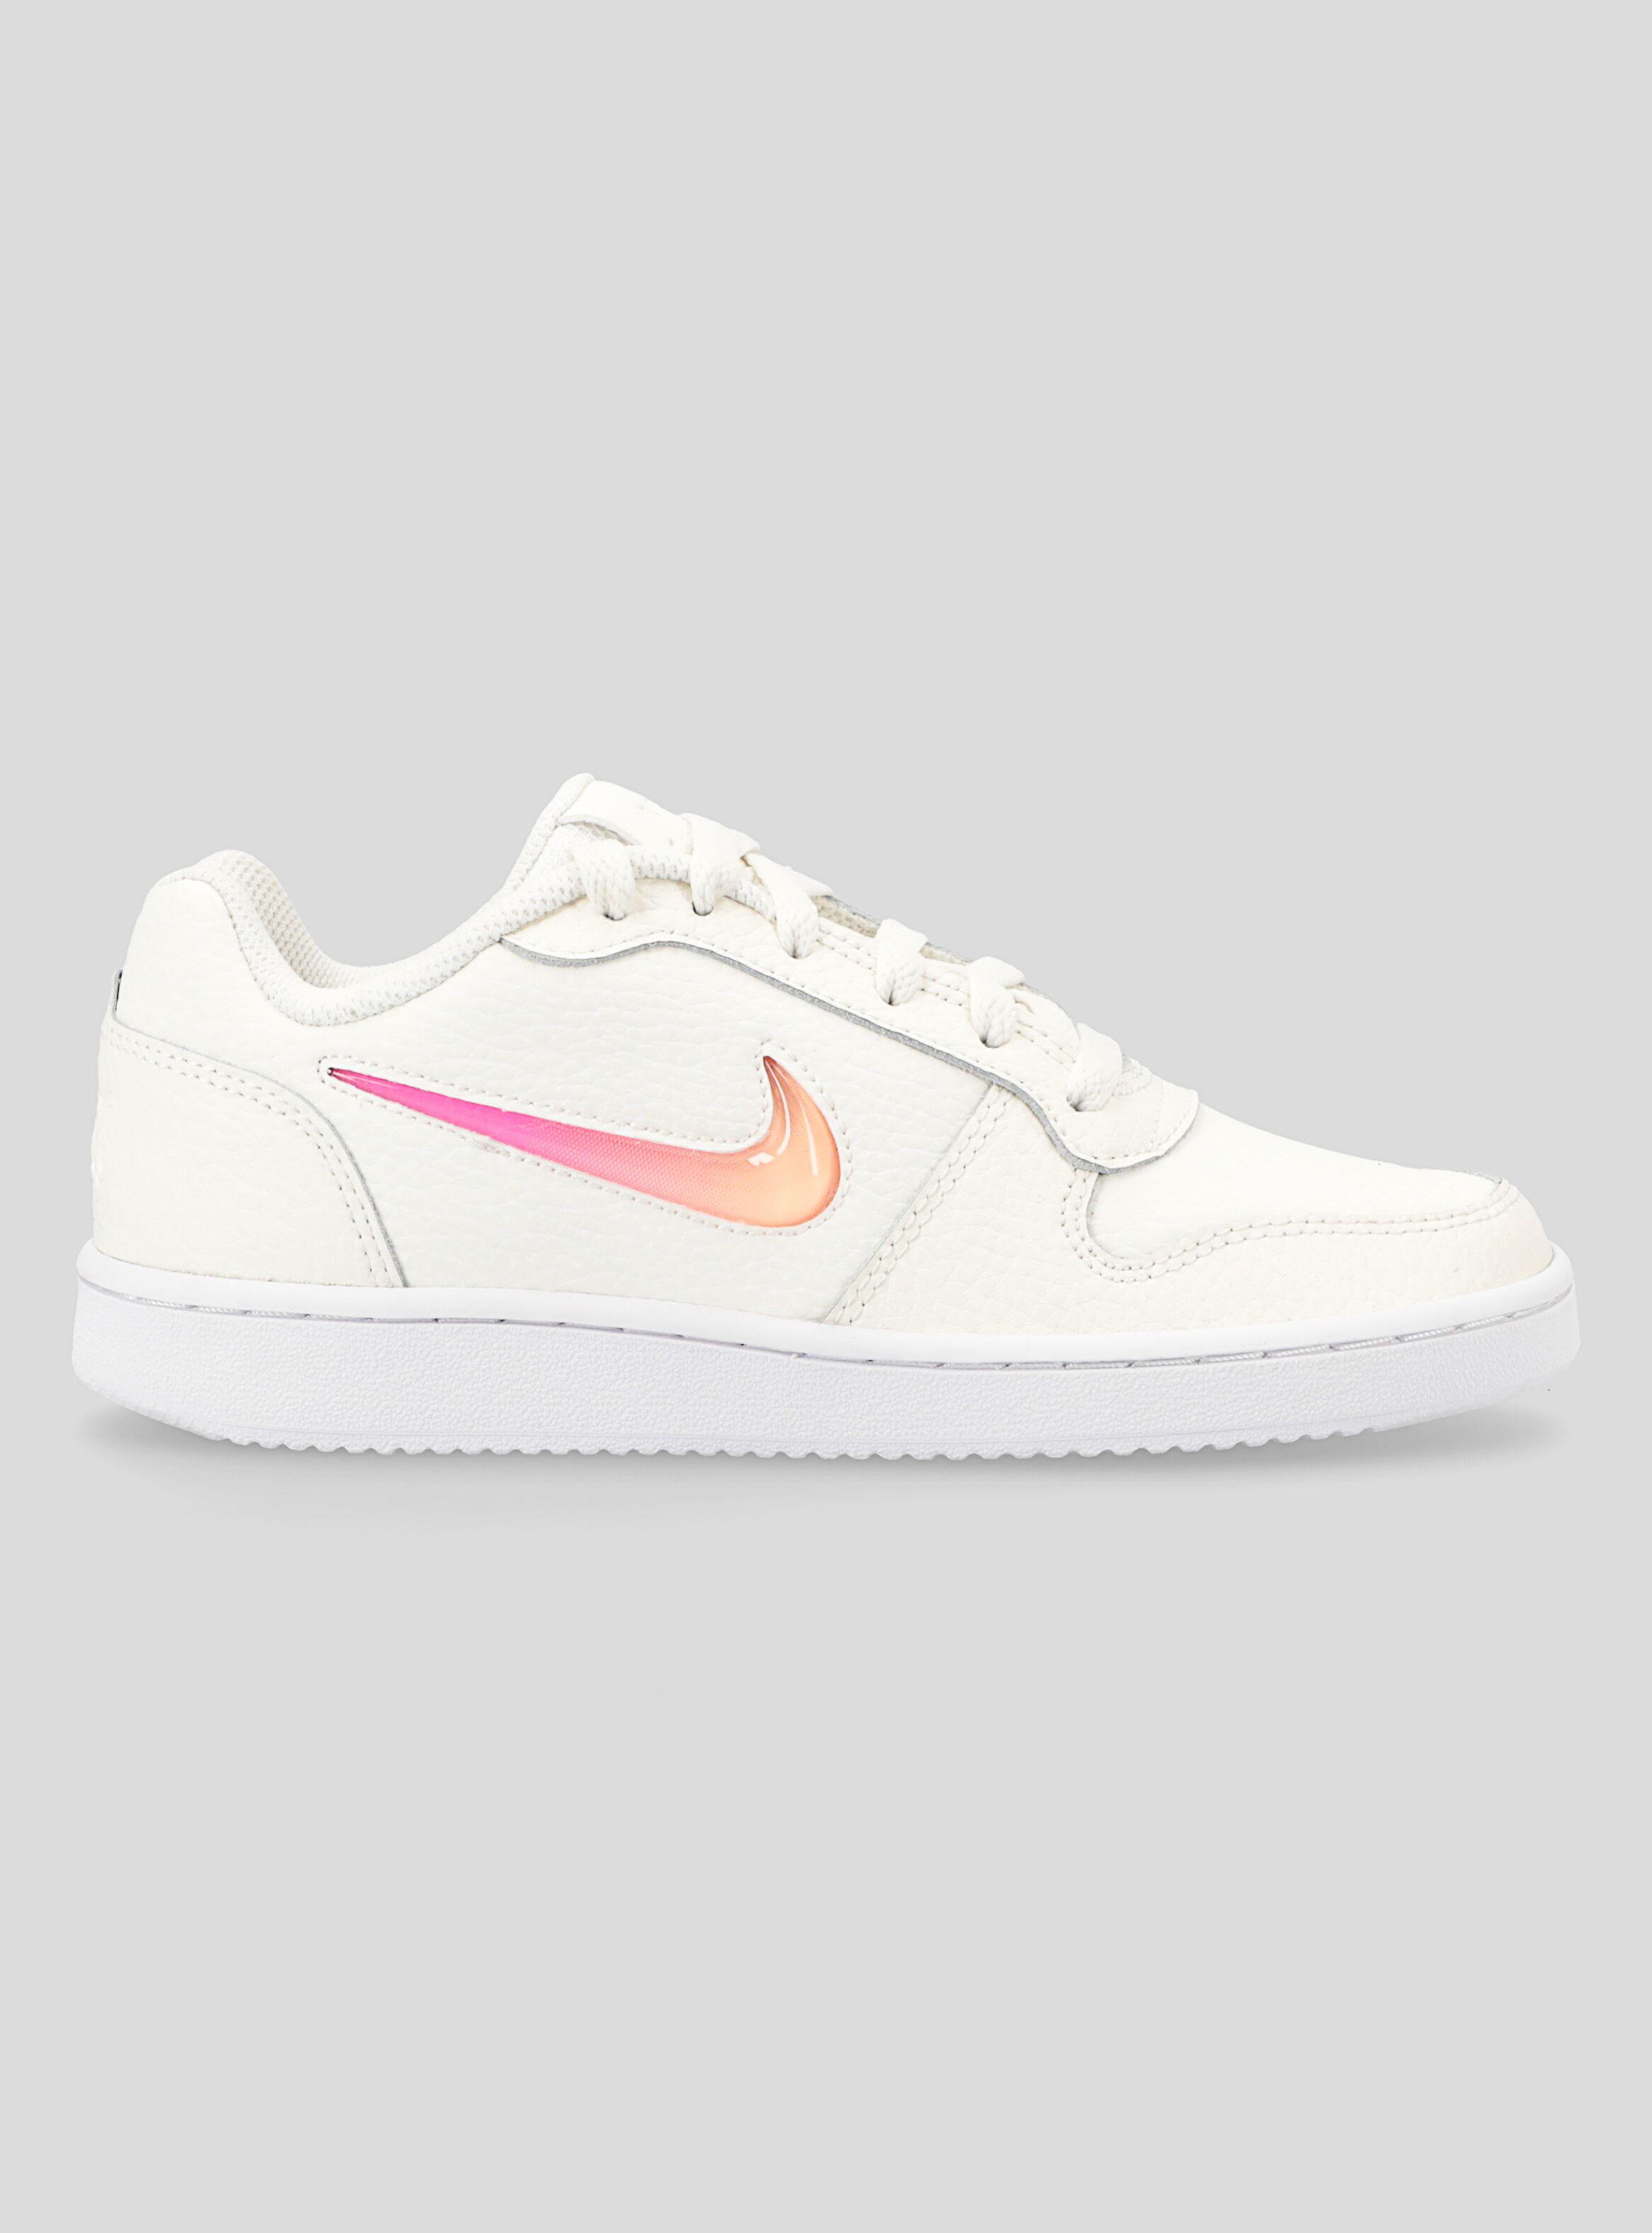 Nike Huarache Mujer Rosas ▷ 18.0€ | DealSan